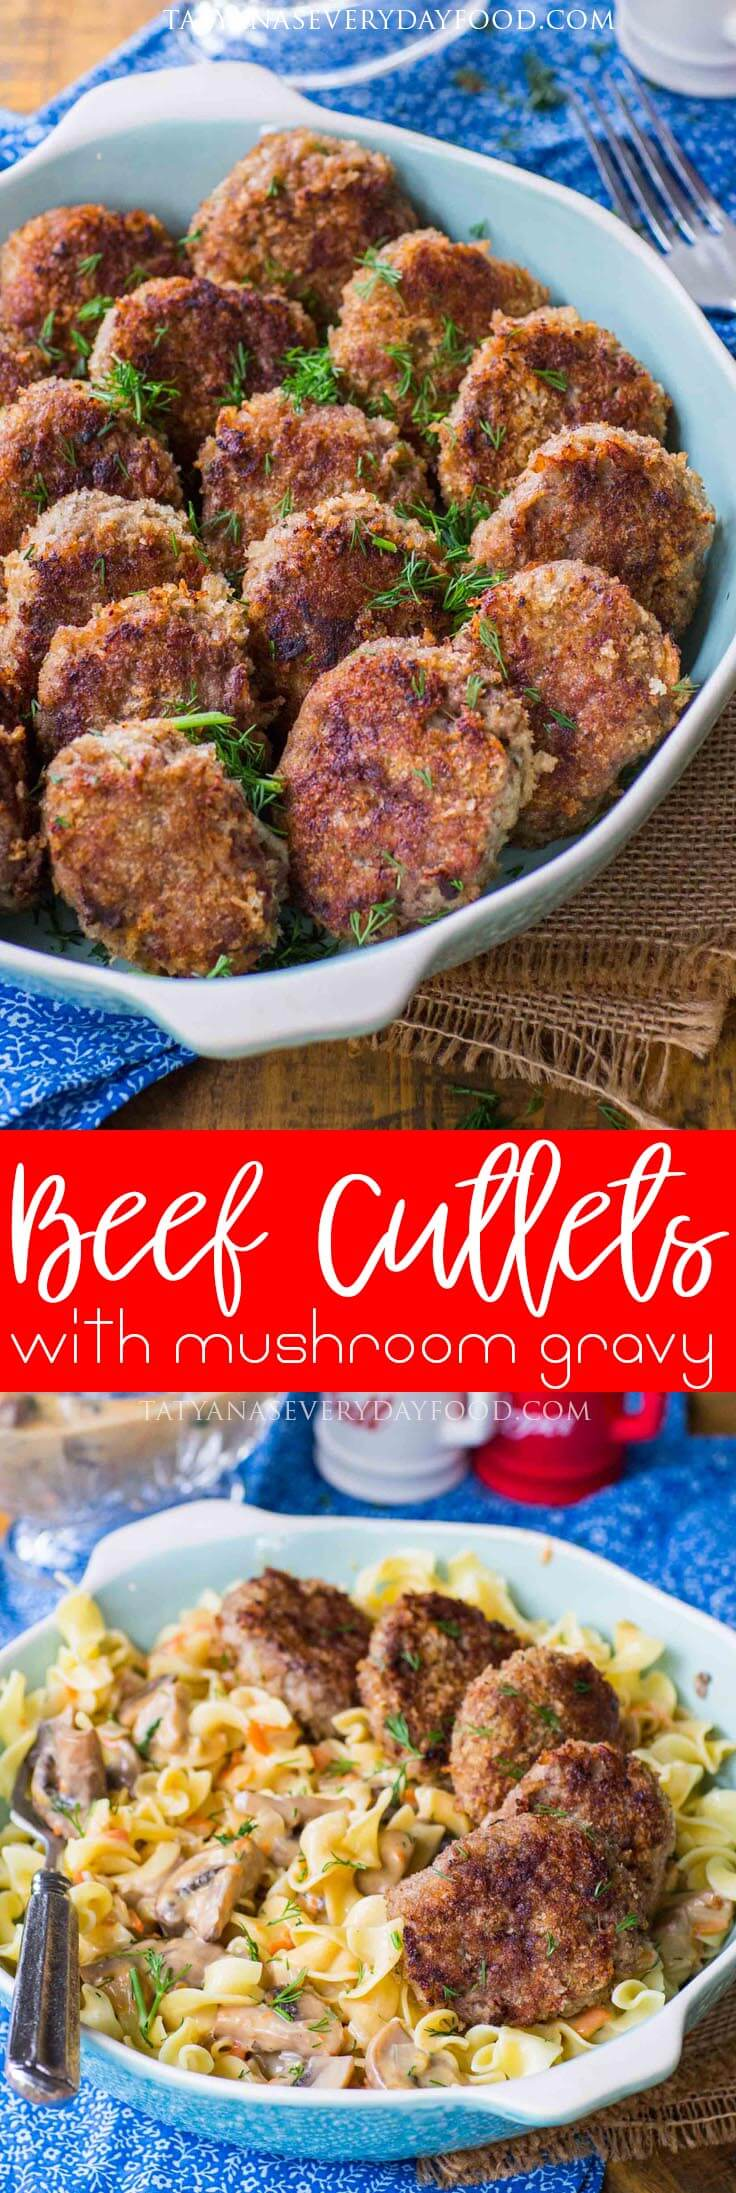 Juicy Beef Cutlets Recipe with mushroom gravy (video recipe)